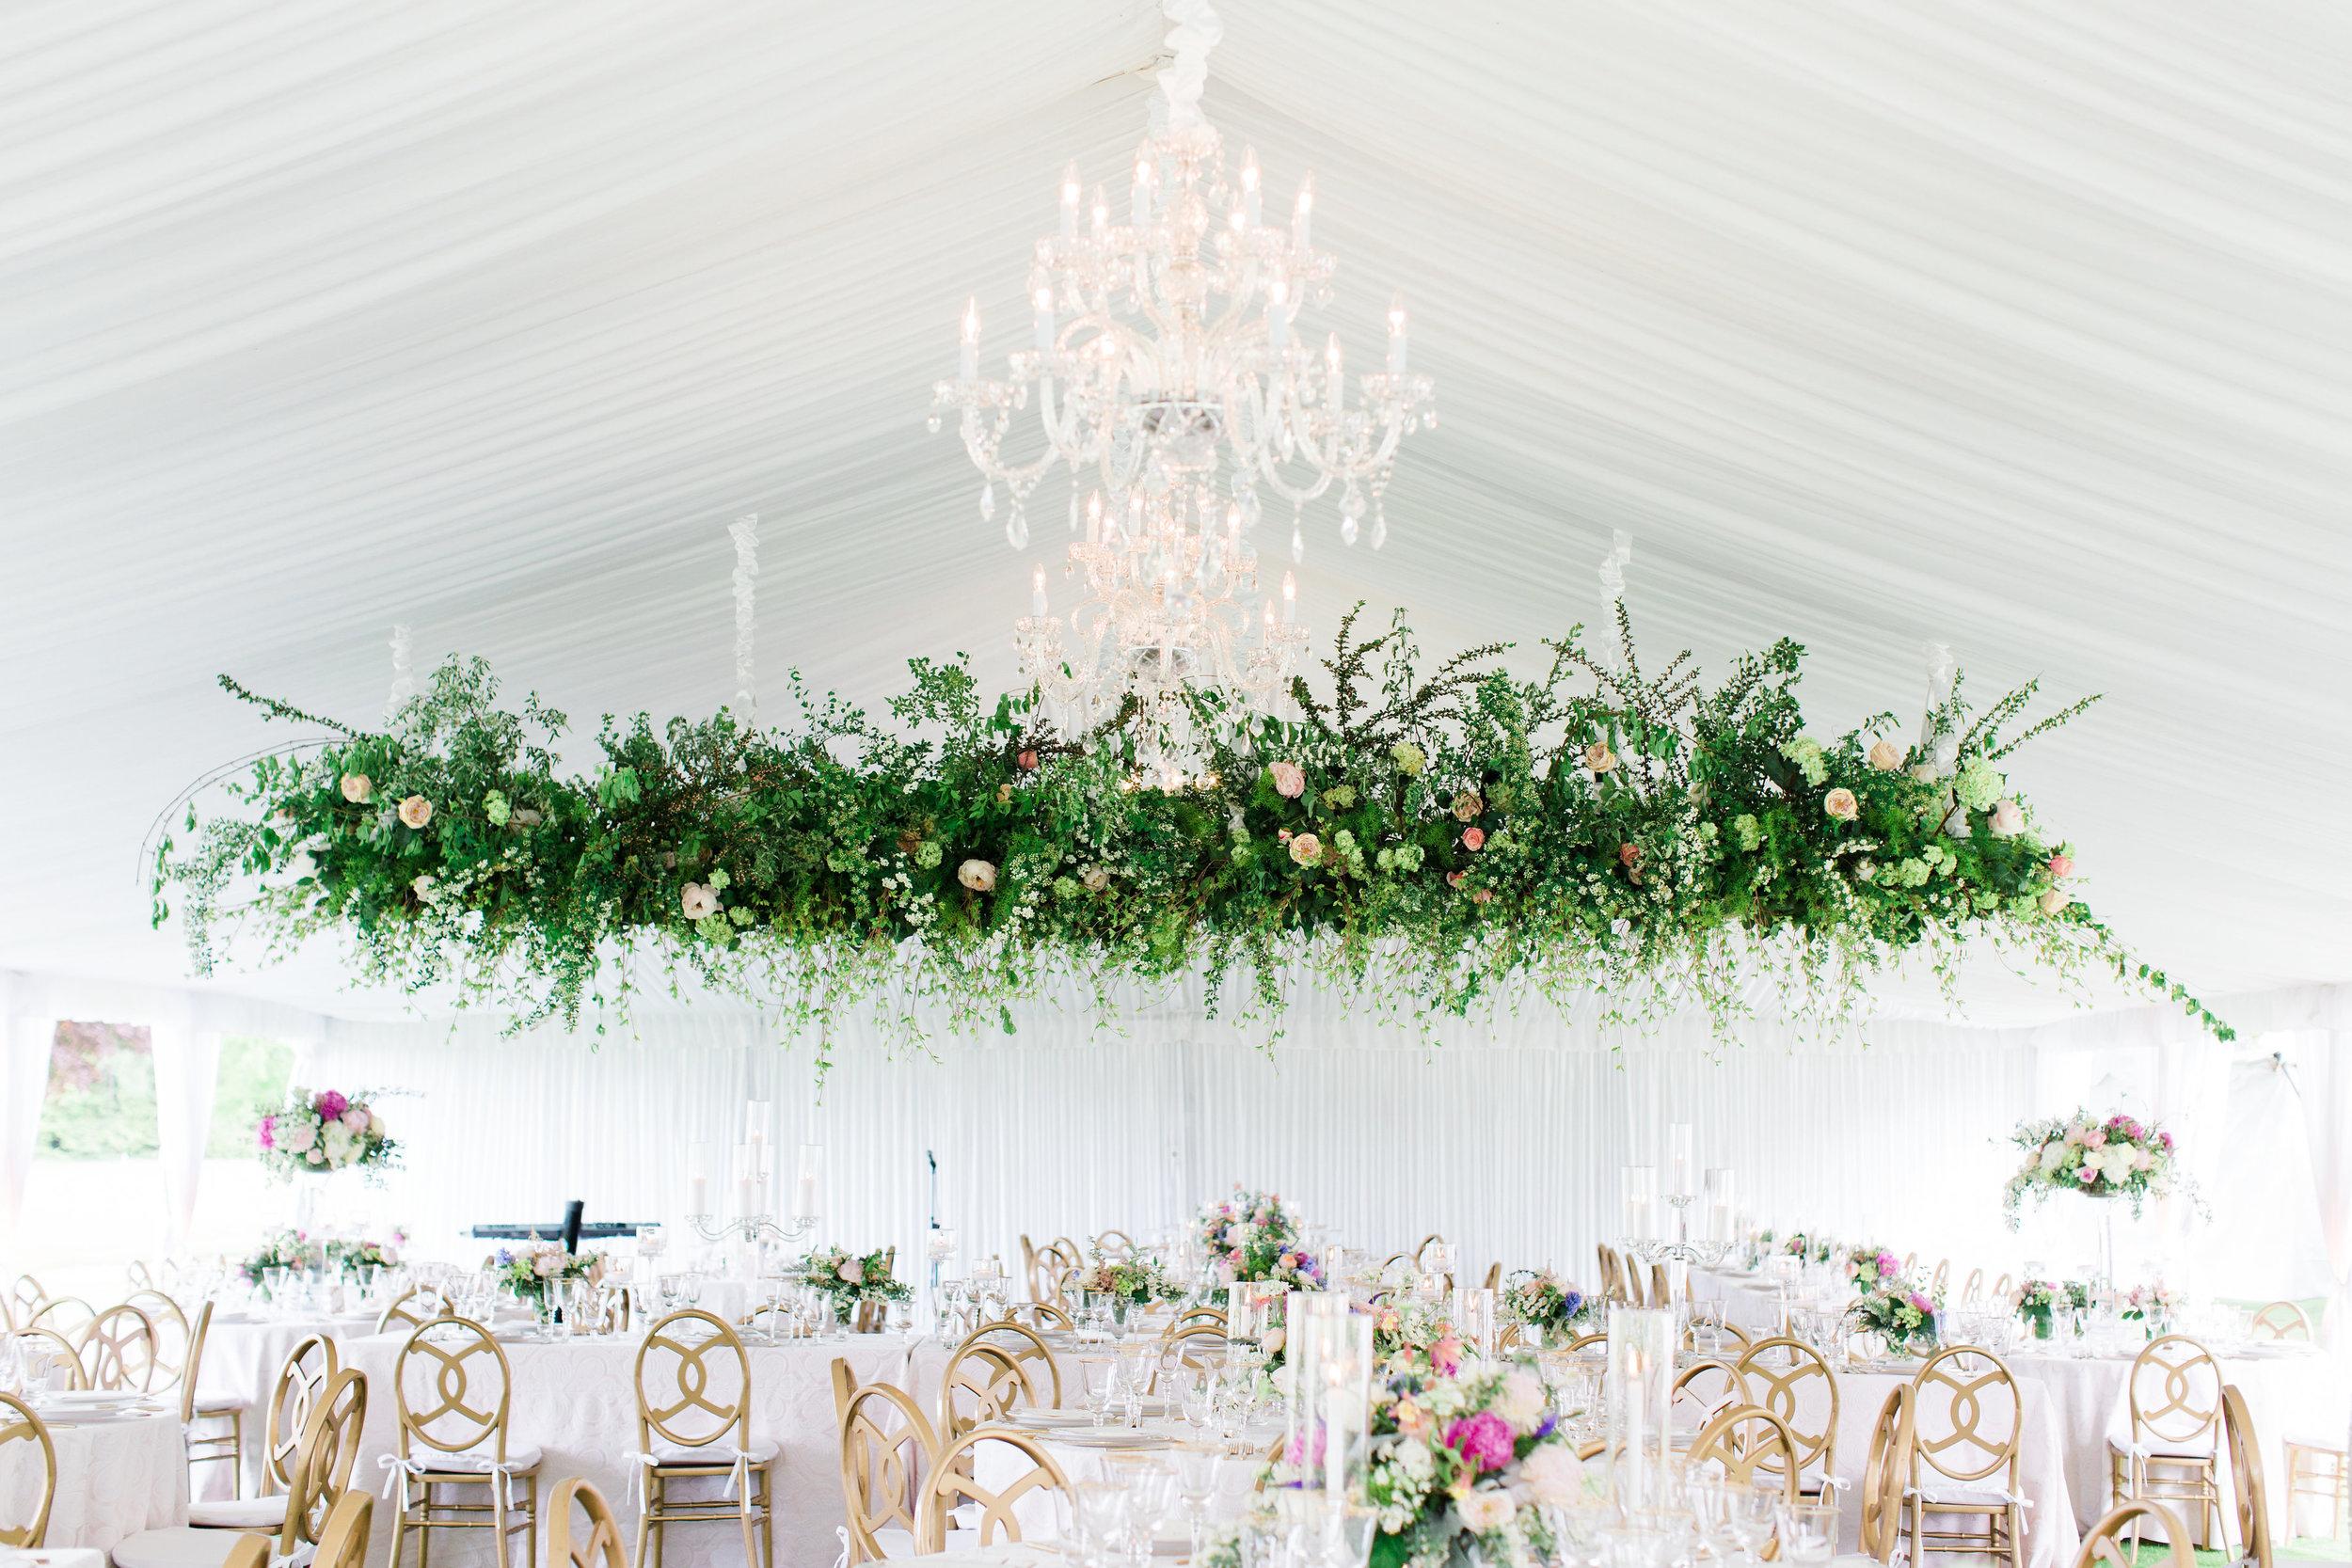 Coffman+Wedding+Reception+Details-5.jpg